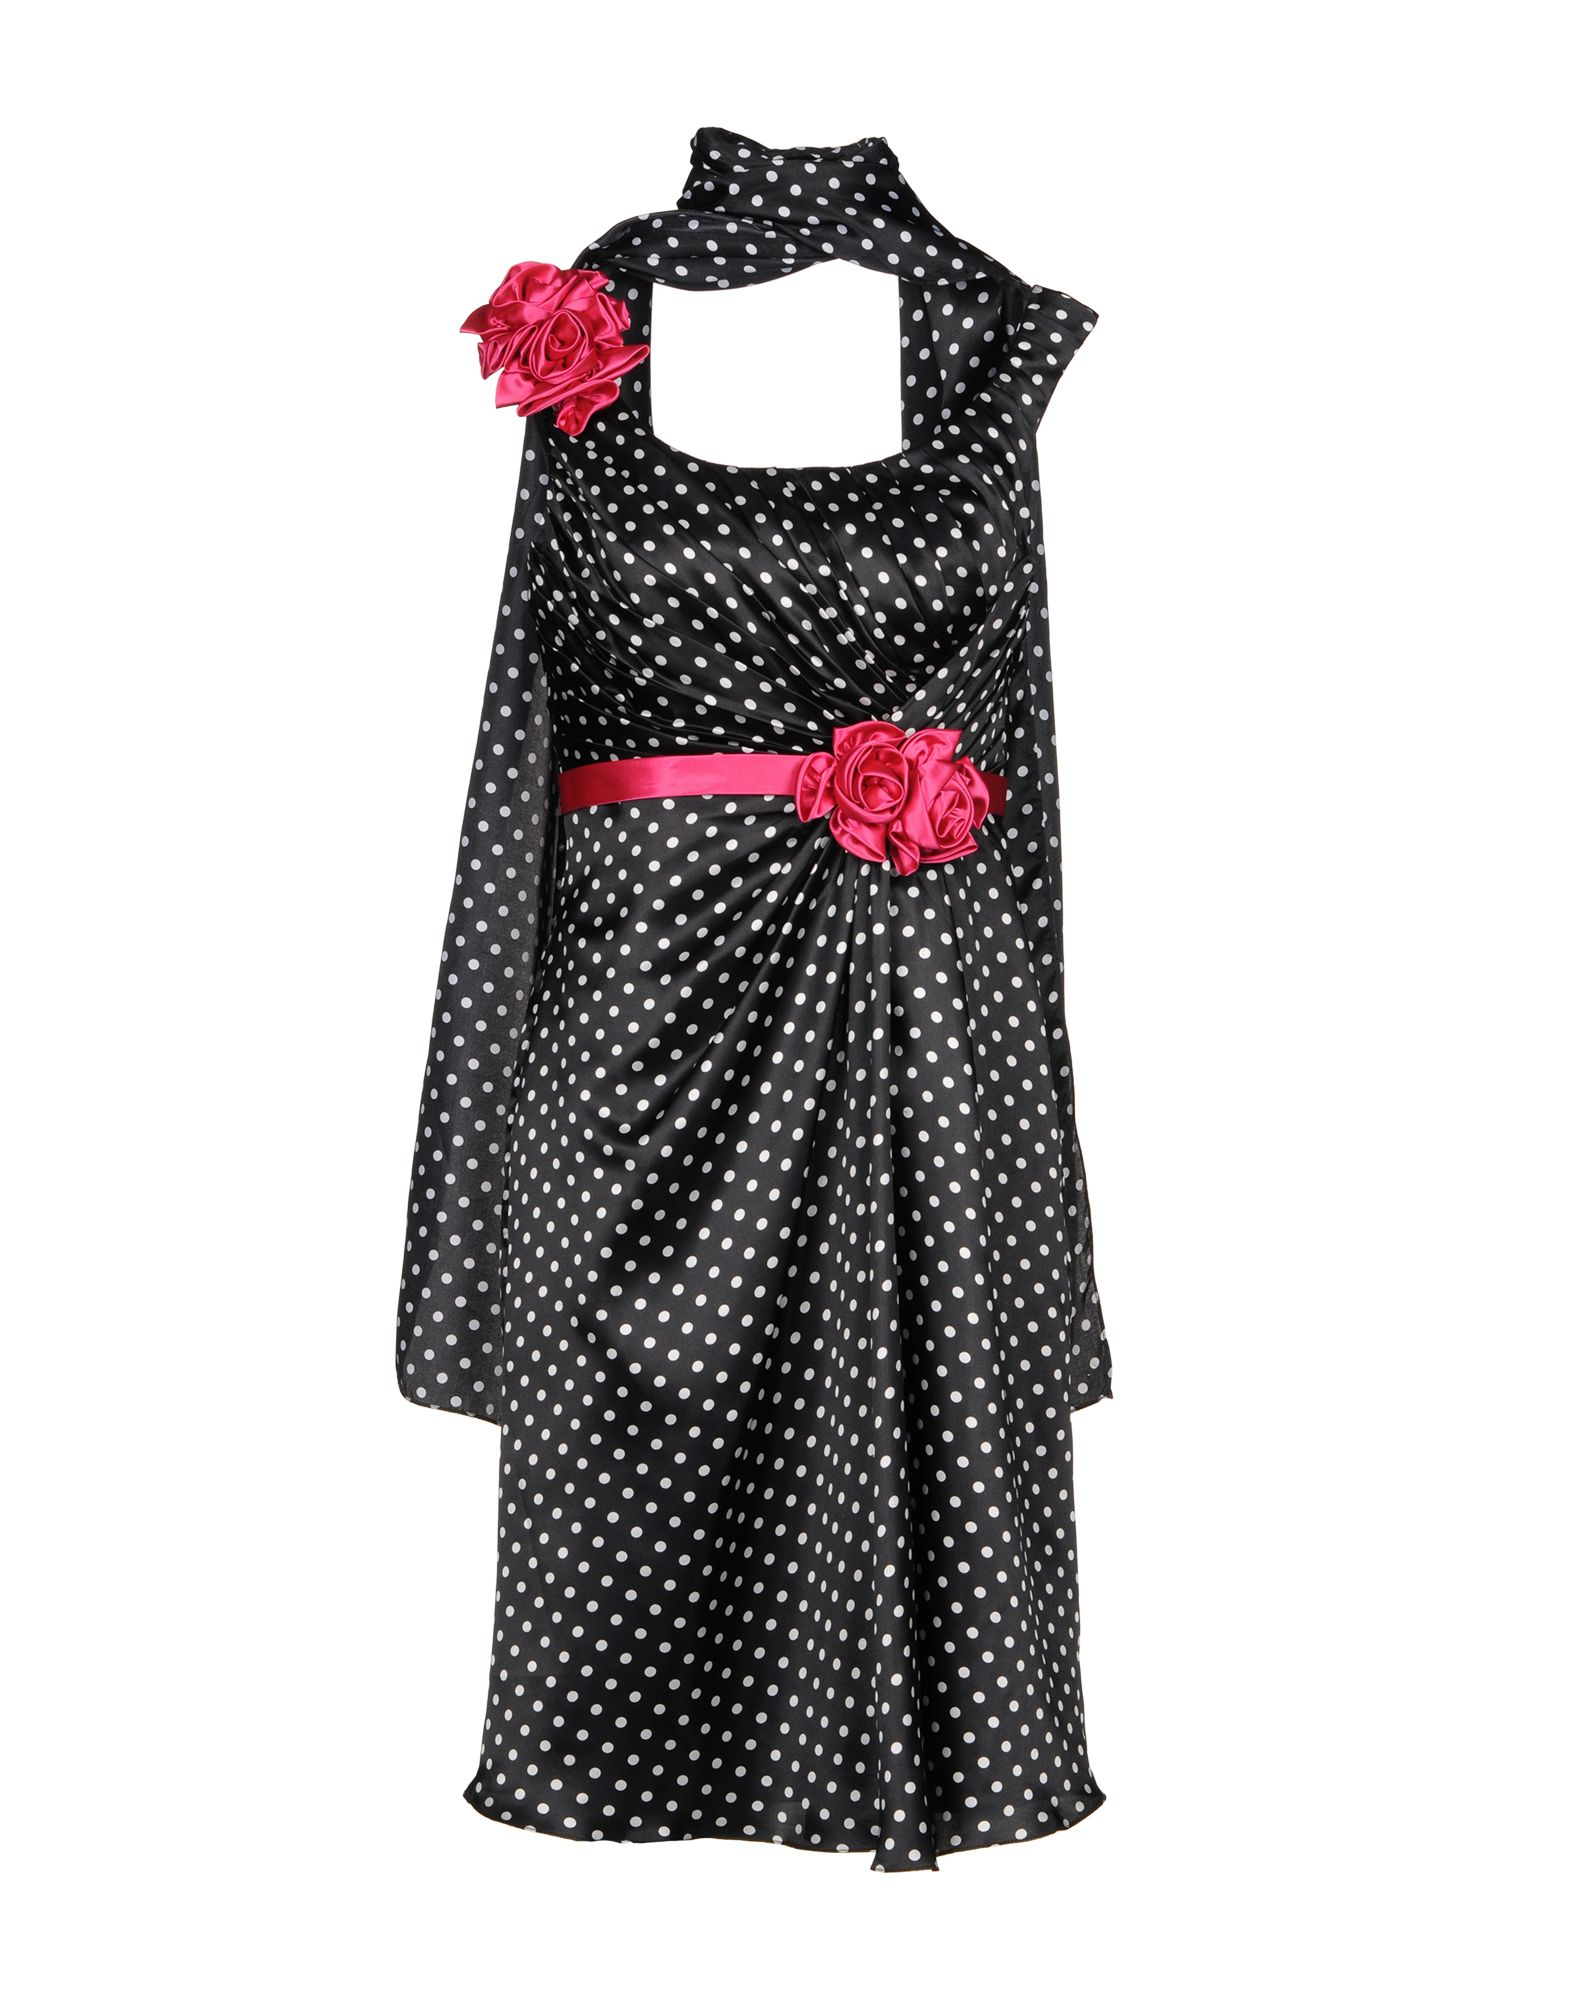 BELLA RHAPSODY by VENUS BRIDAL Платье до колена свадебное платье prettycolor bridal 0331